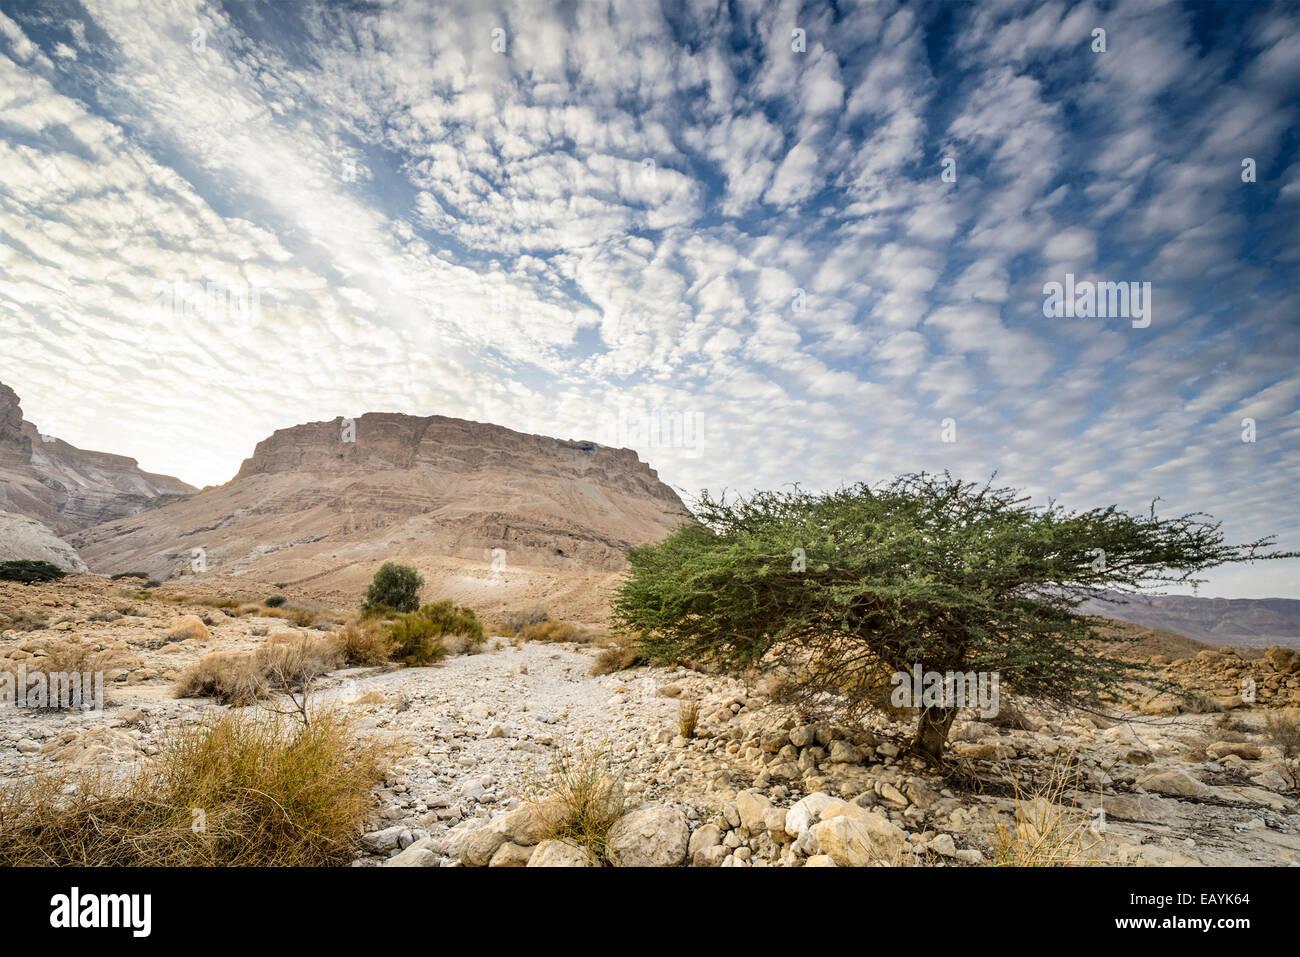 Masada, Israel ancient rock plateau fortress in the Judaean Desert. - Stock Image